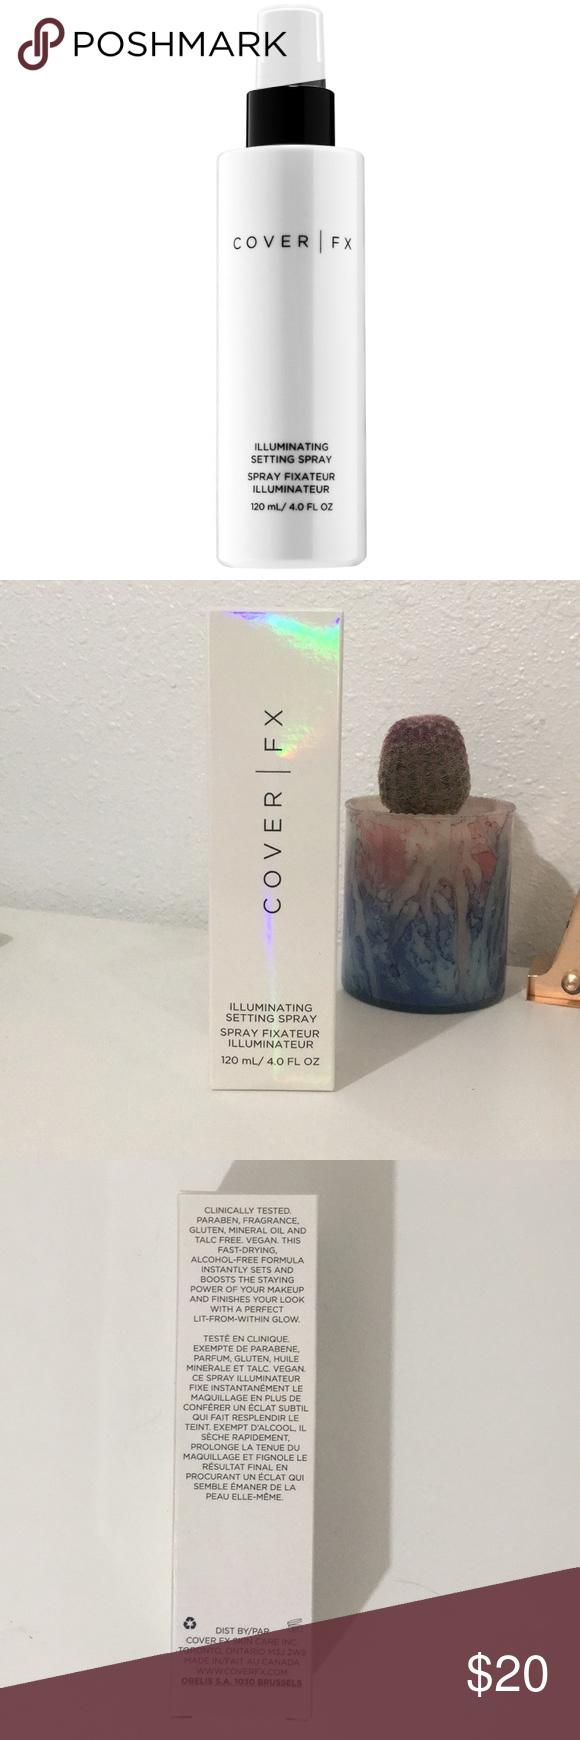 Cover FX illuminating setting spray BRAND NEW!!! Box has